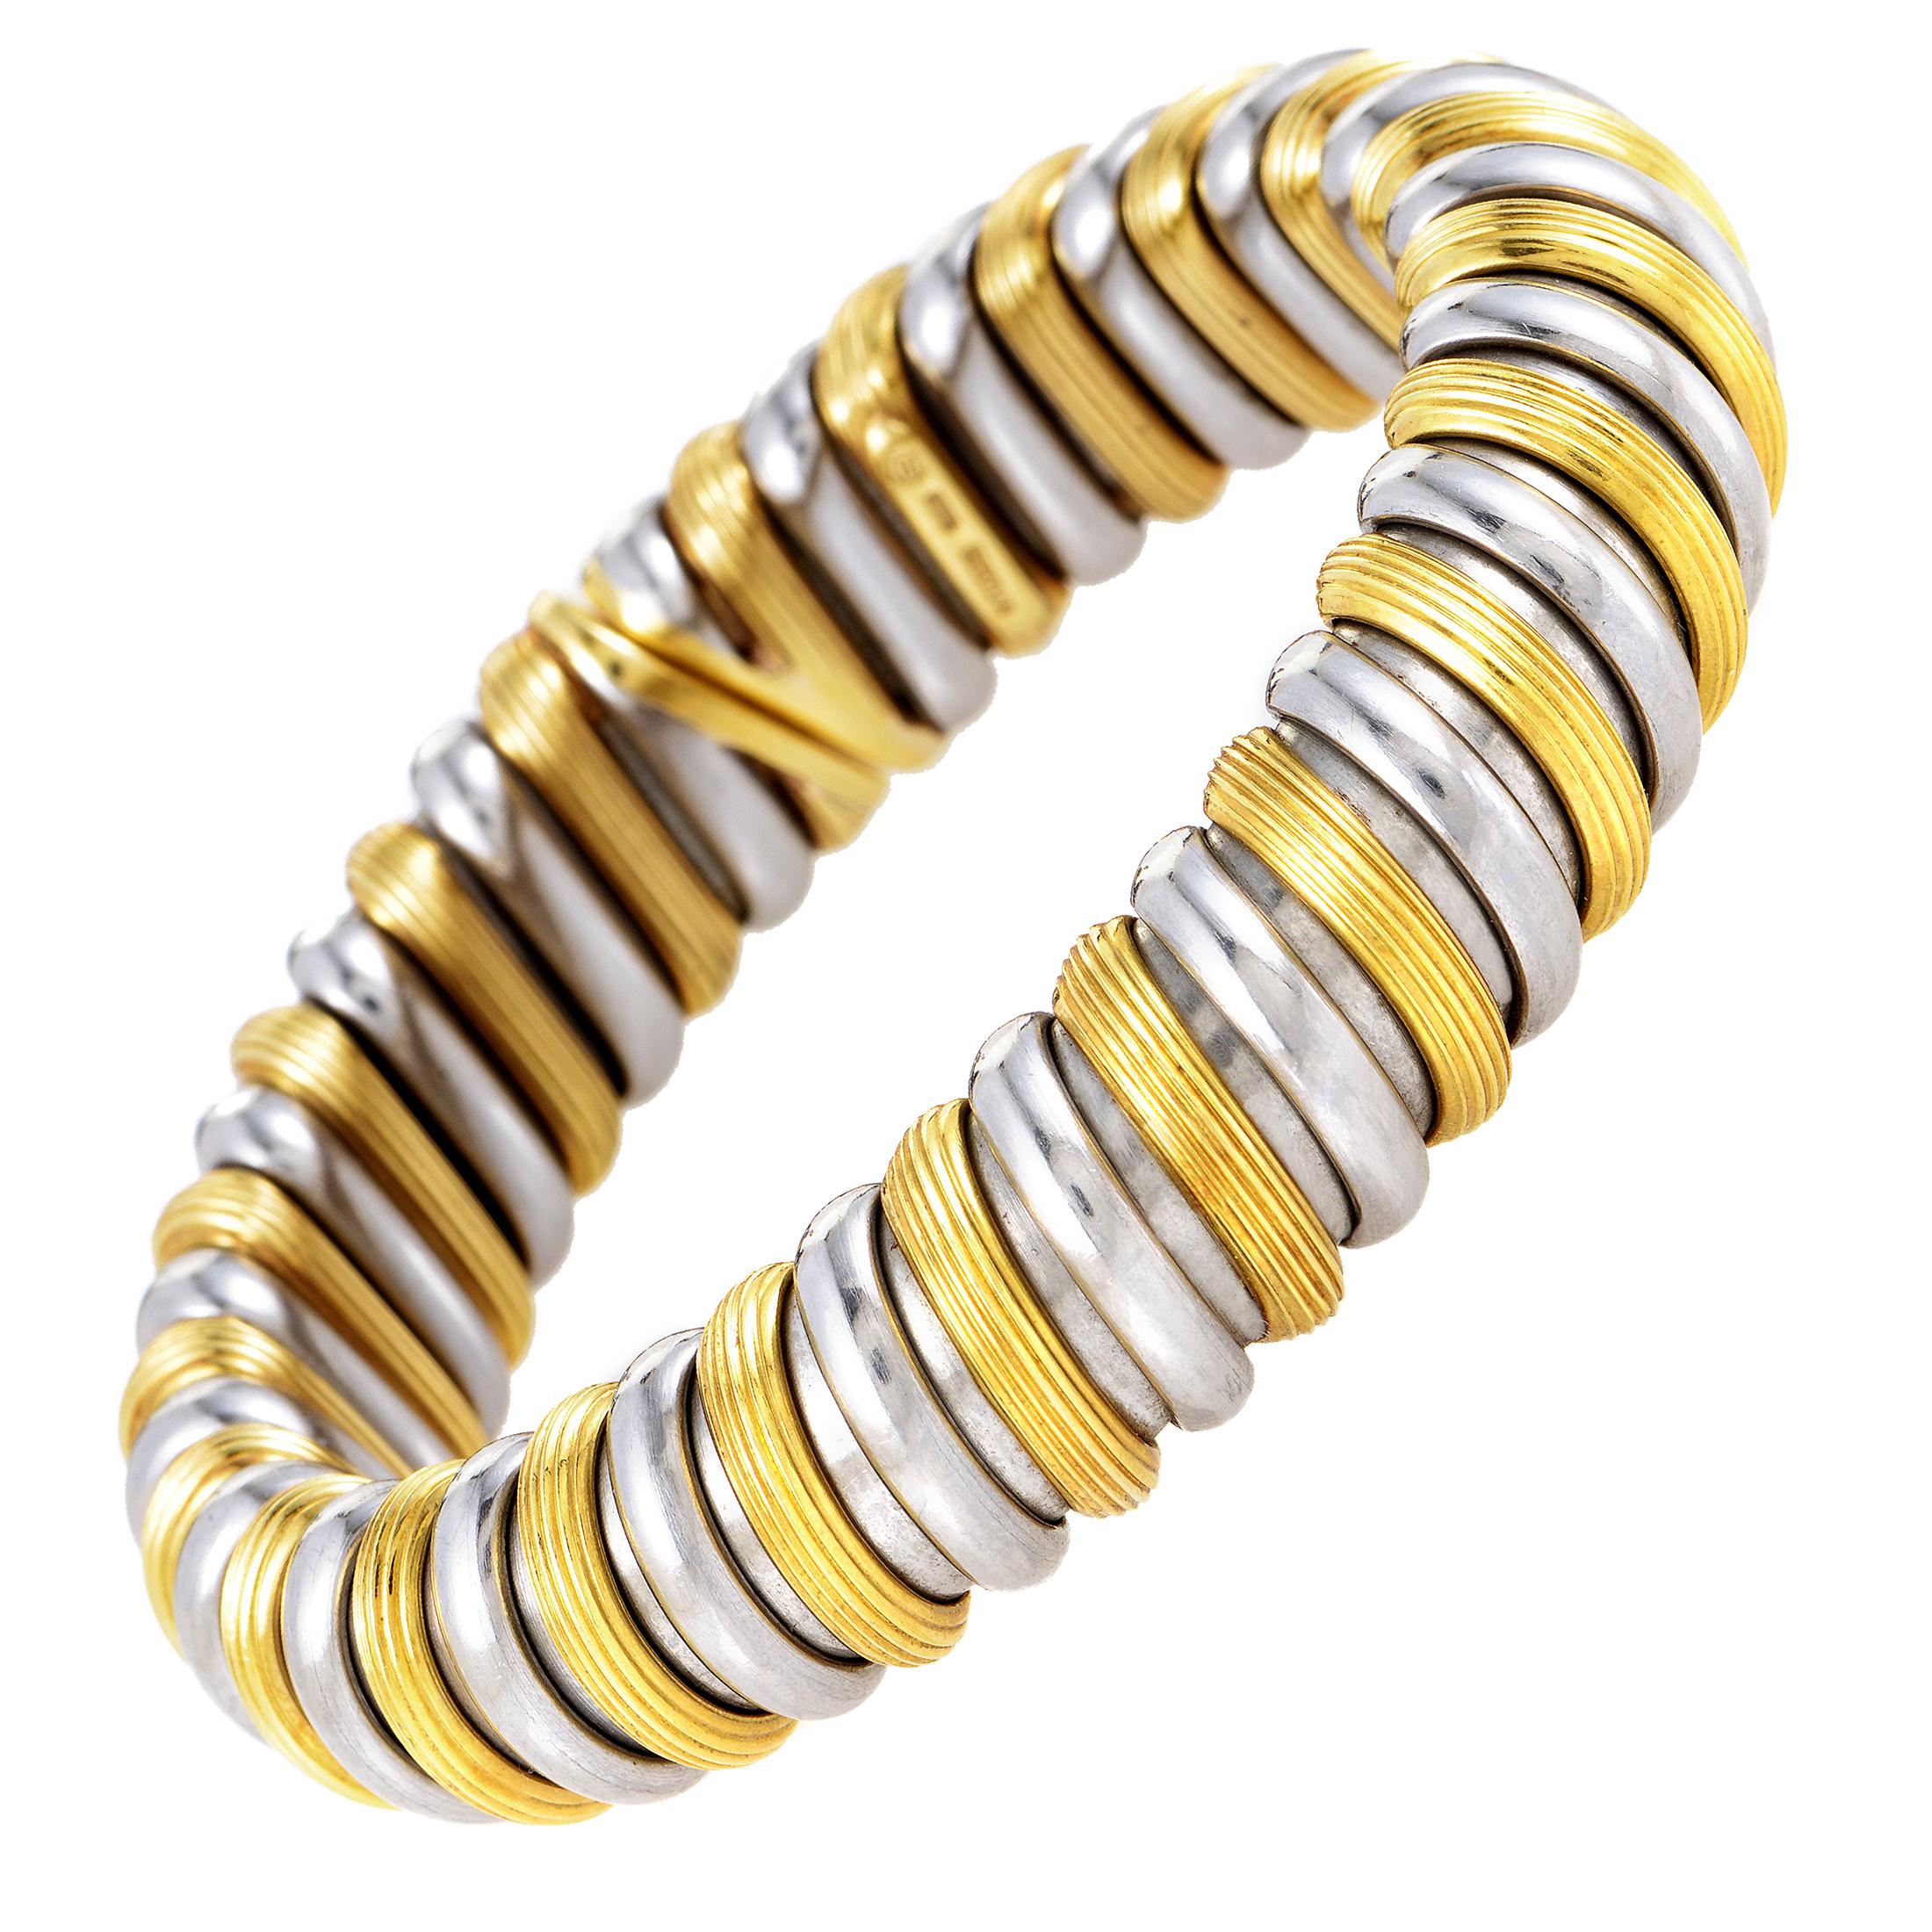 Bvlgari Women's 18K Yellow Gold & Stainless Steel Bangle Bracelet